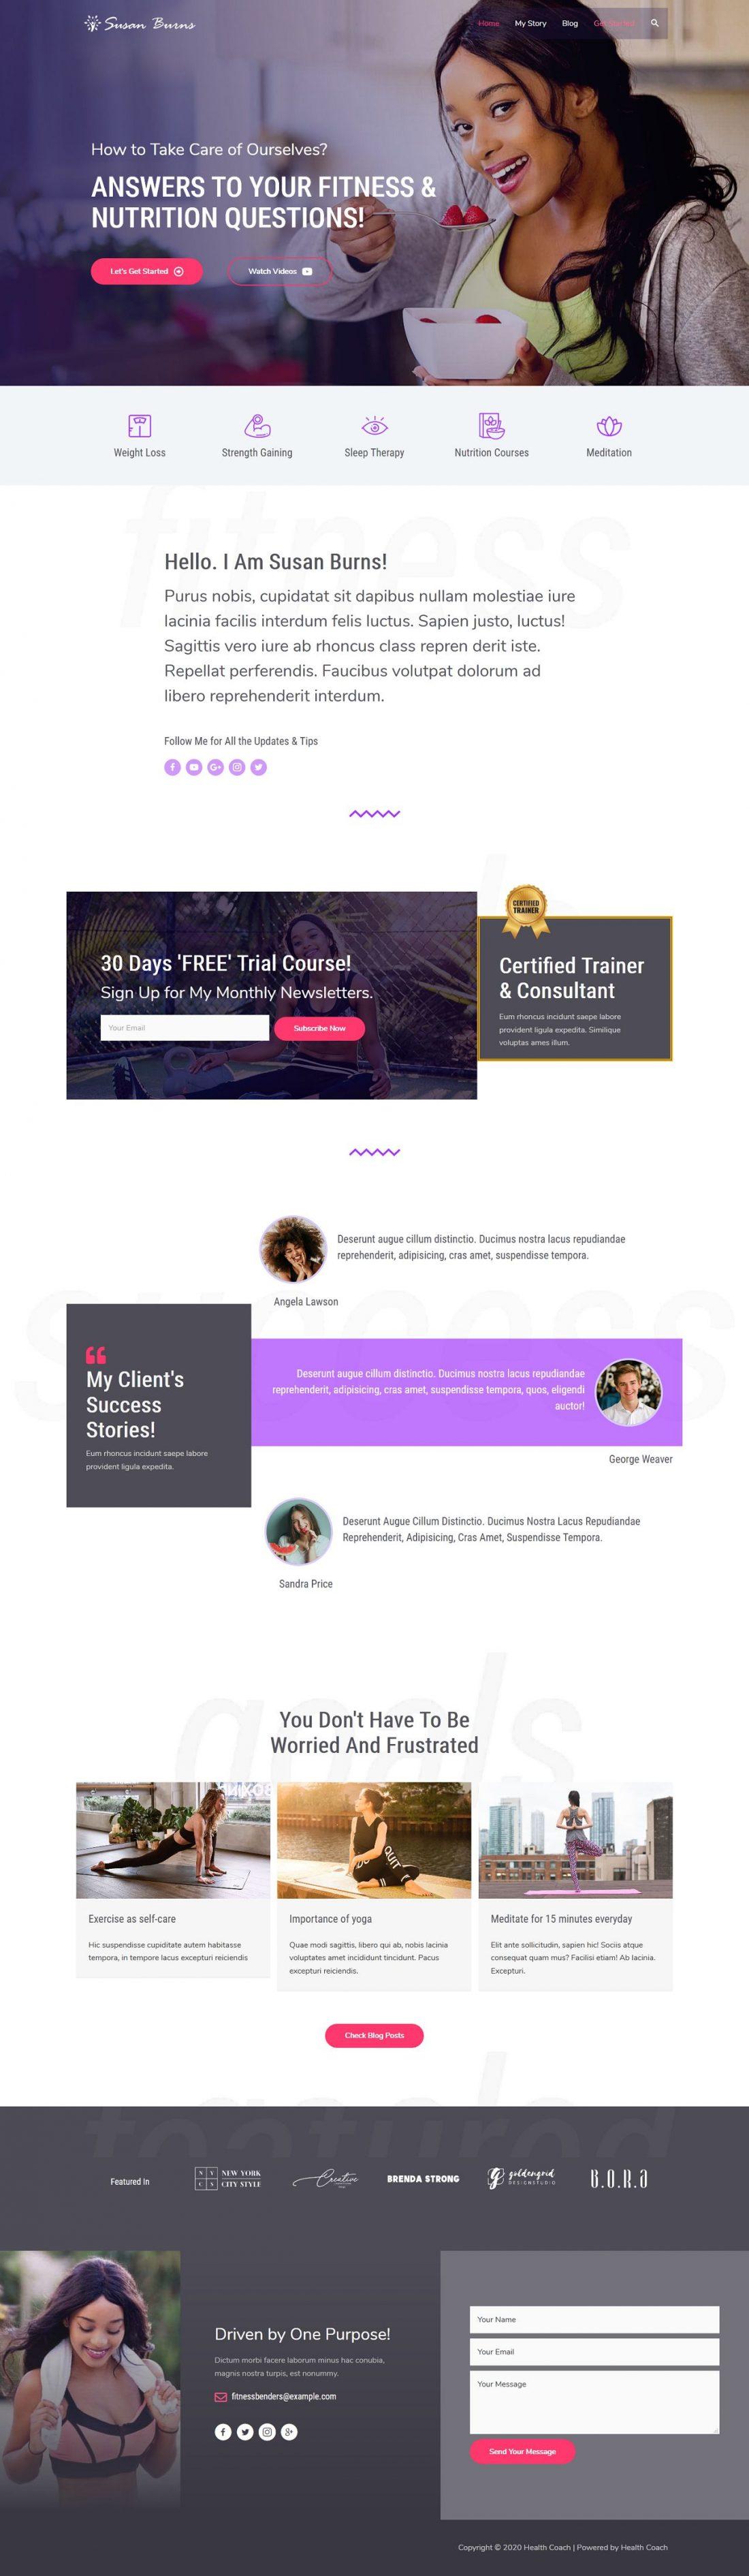 Fagowi.com Website Design Templates For Health Coach Female - Home Page Image